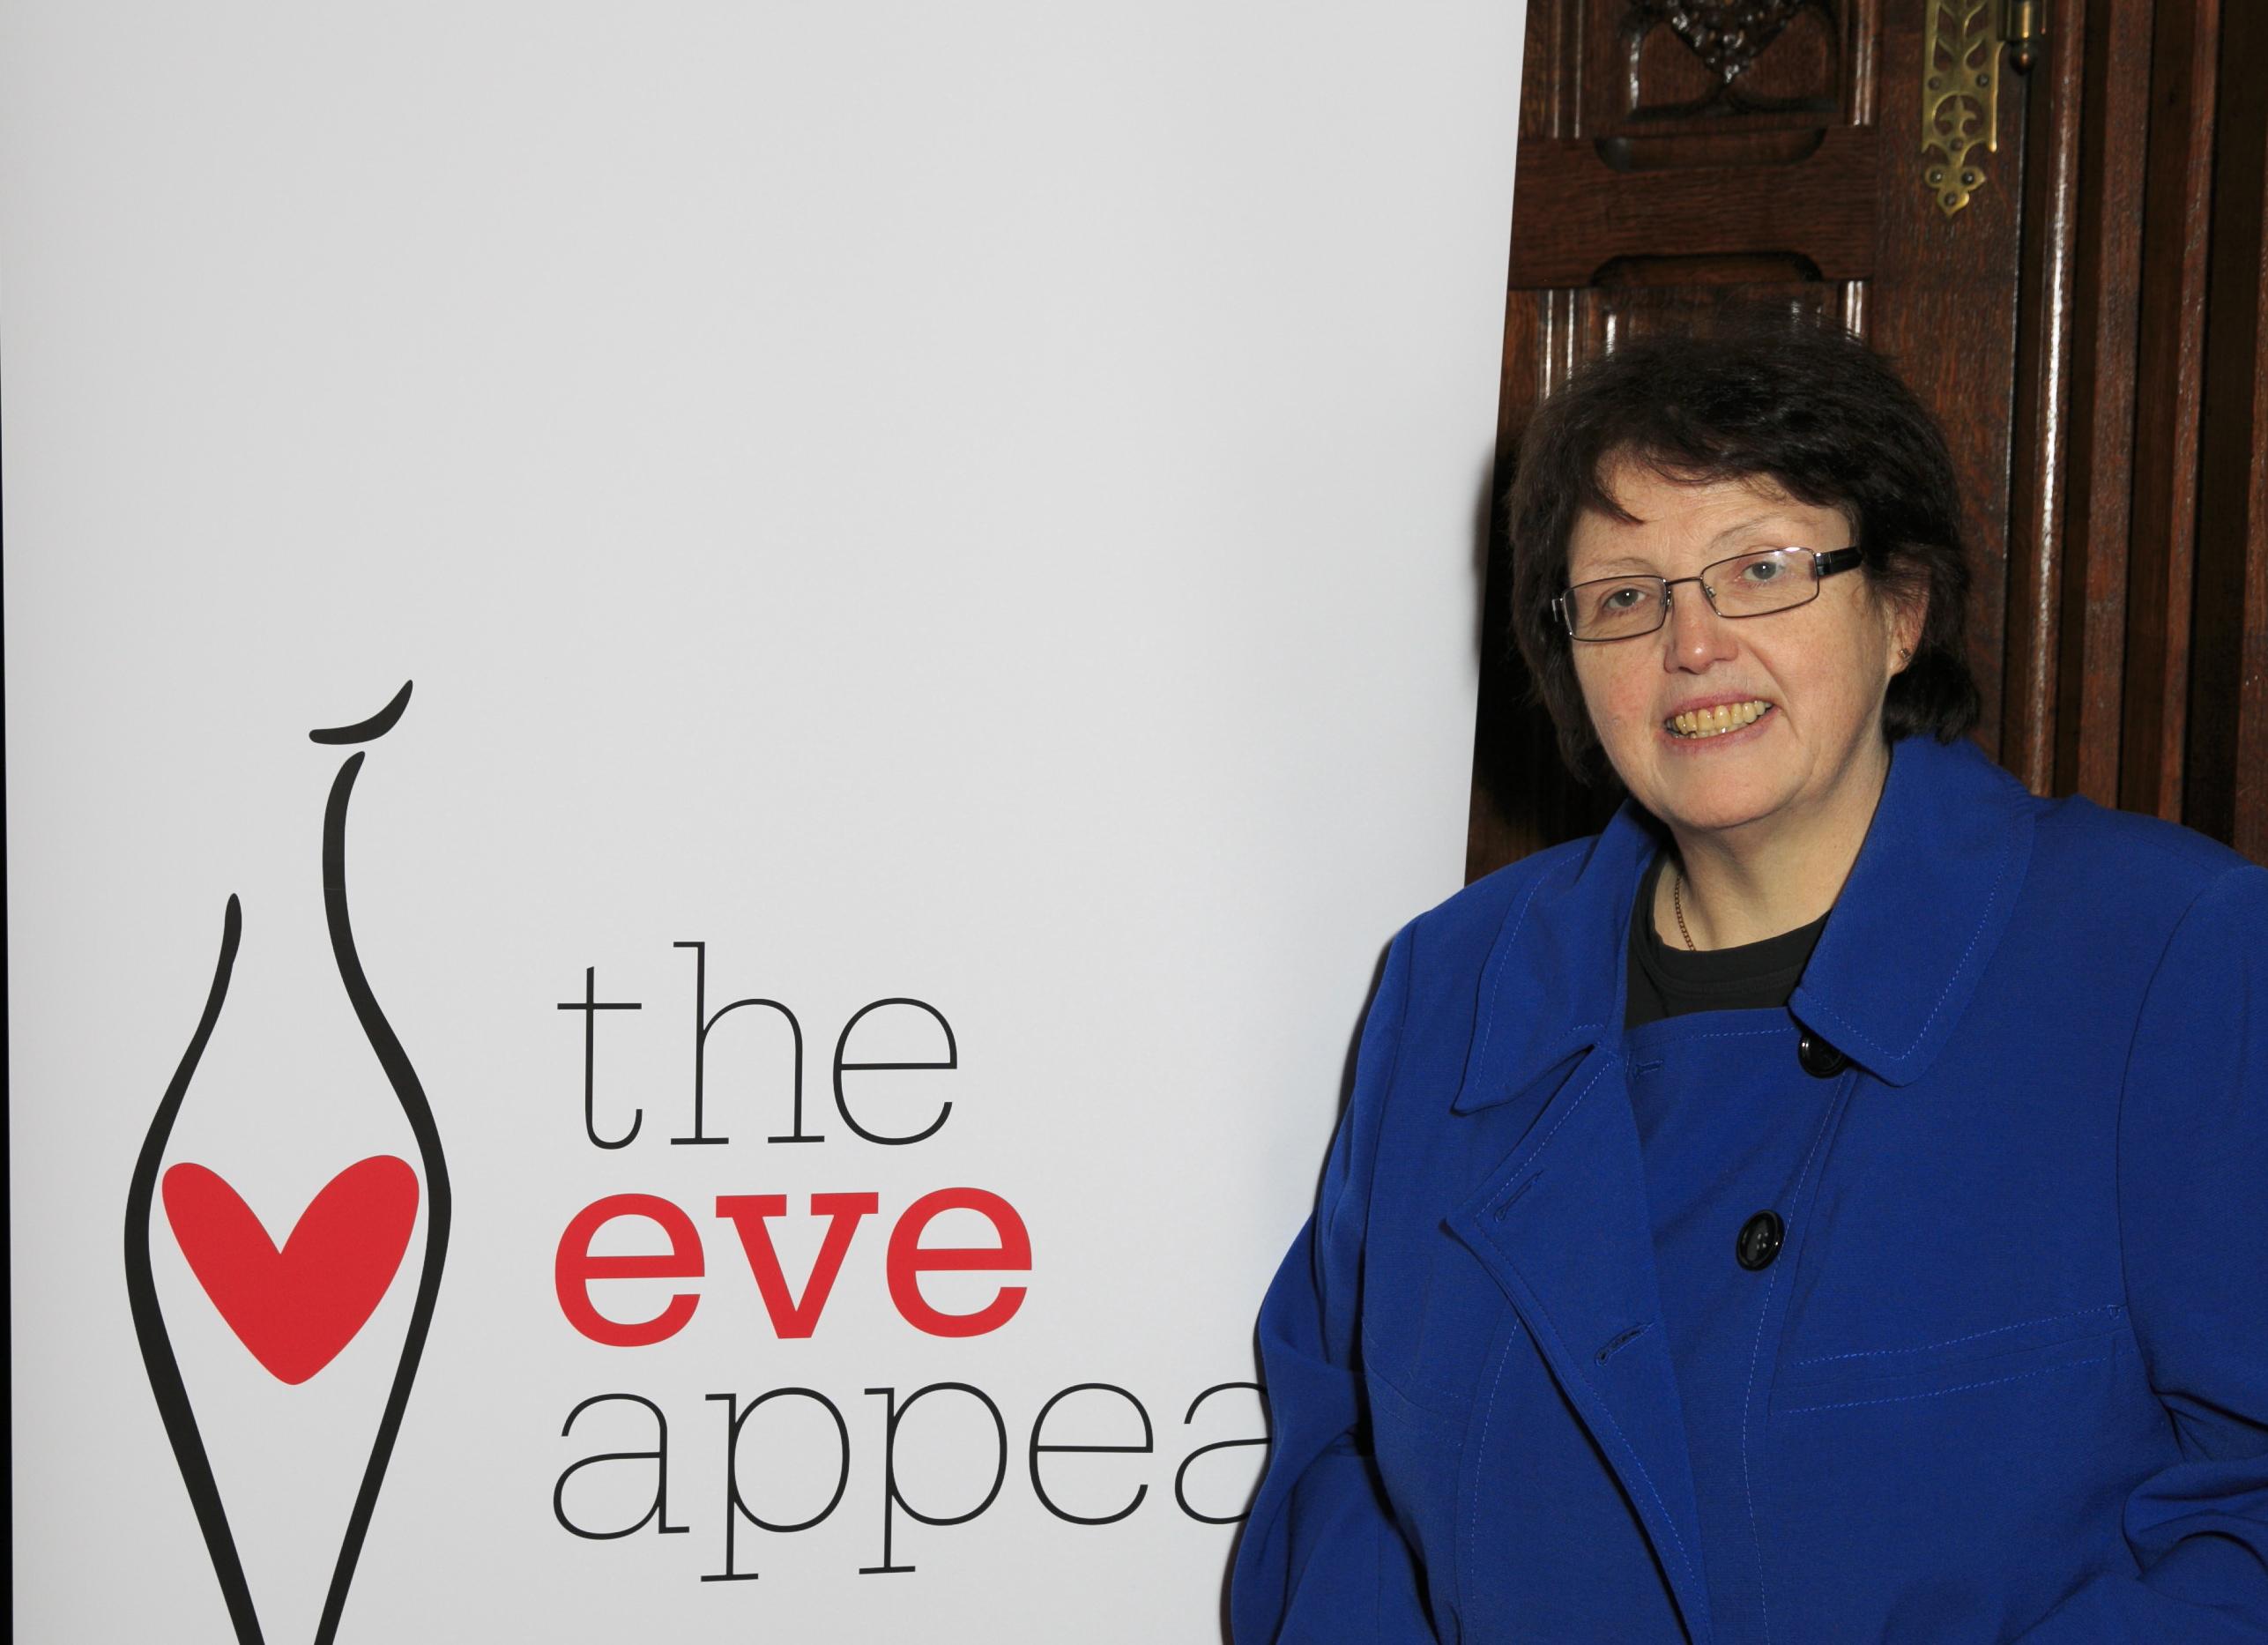 Rosie_Cooper_at_The_Eve_Appeala.jpg